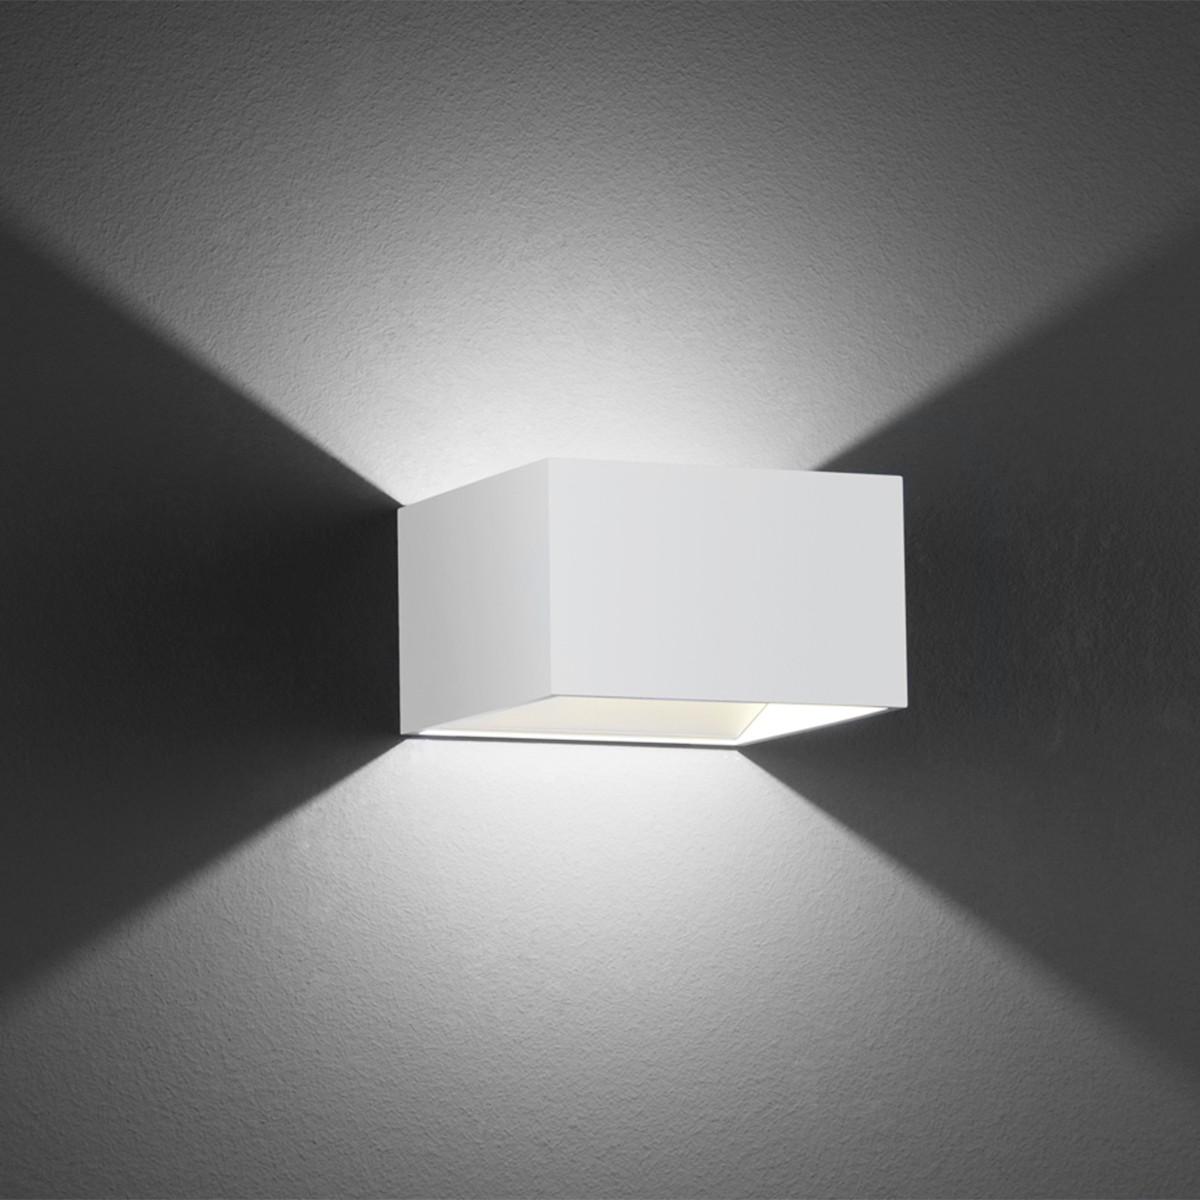 B-Leuchten Cube Wandleuchte, weiß